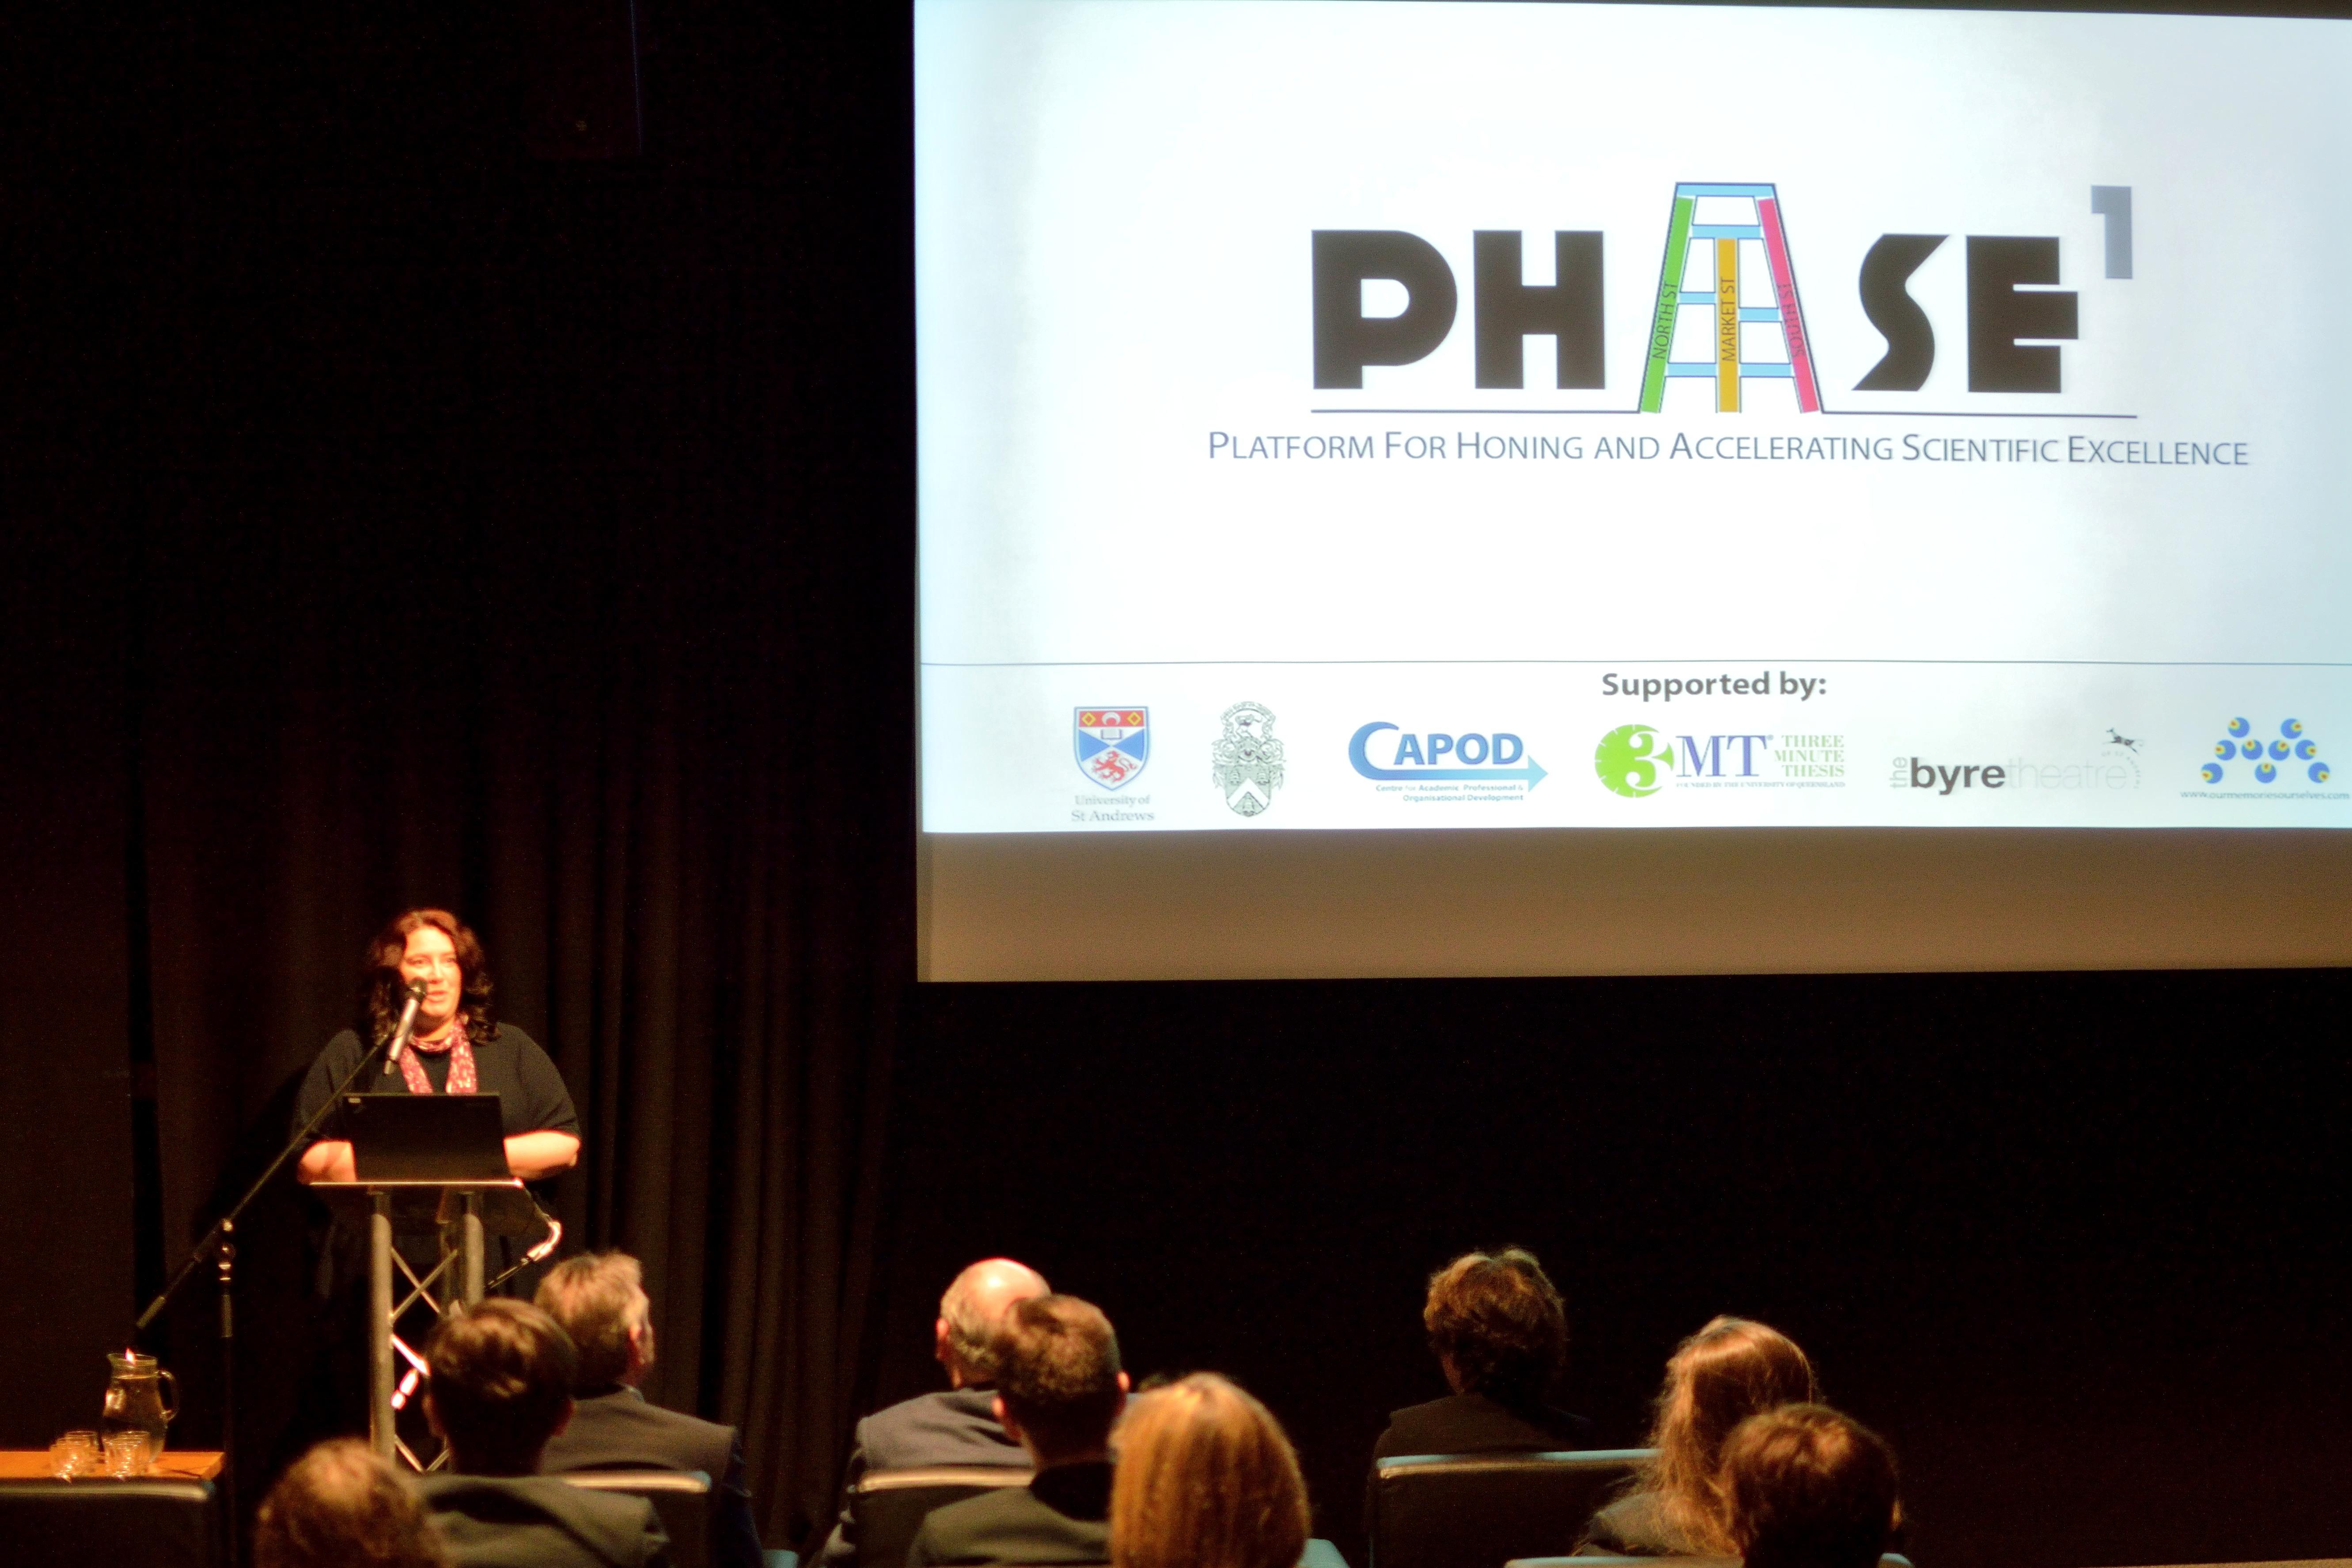 Opening Remarks: Dr Mhairi Stewart